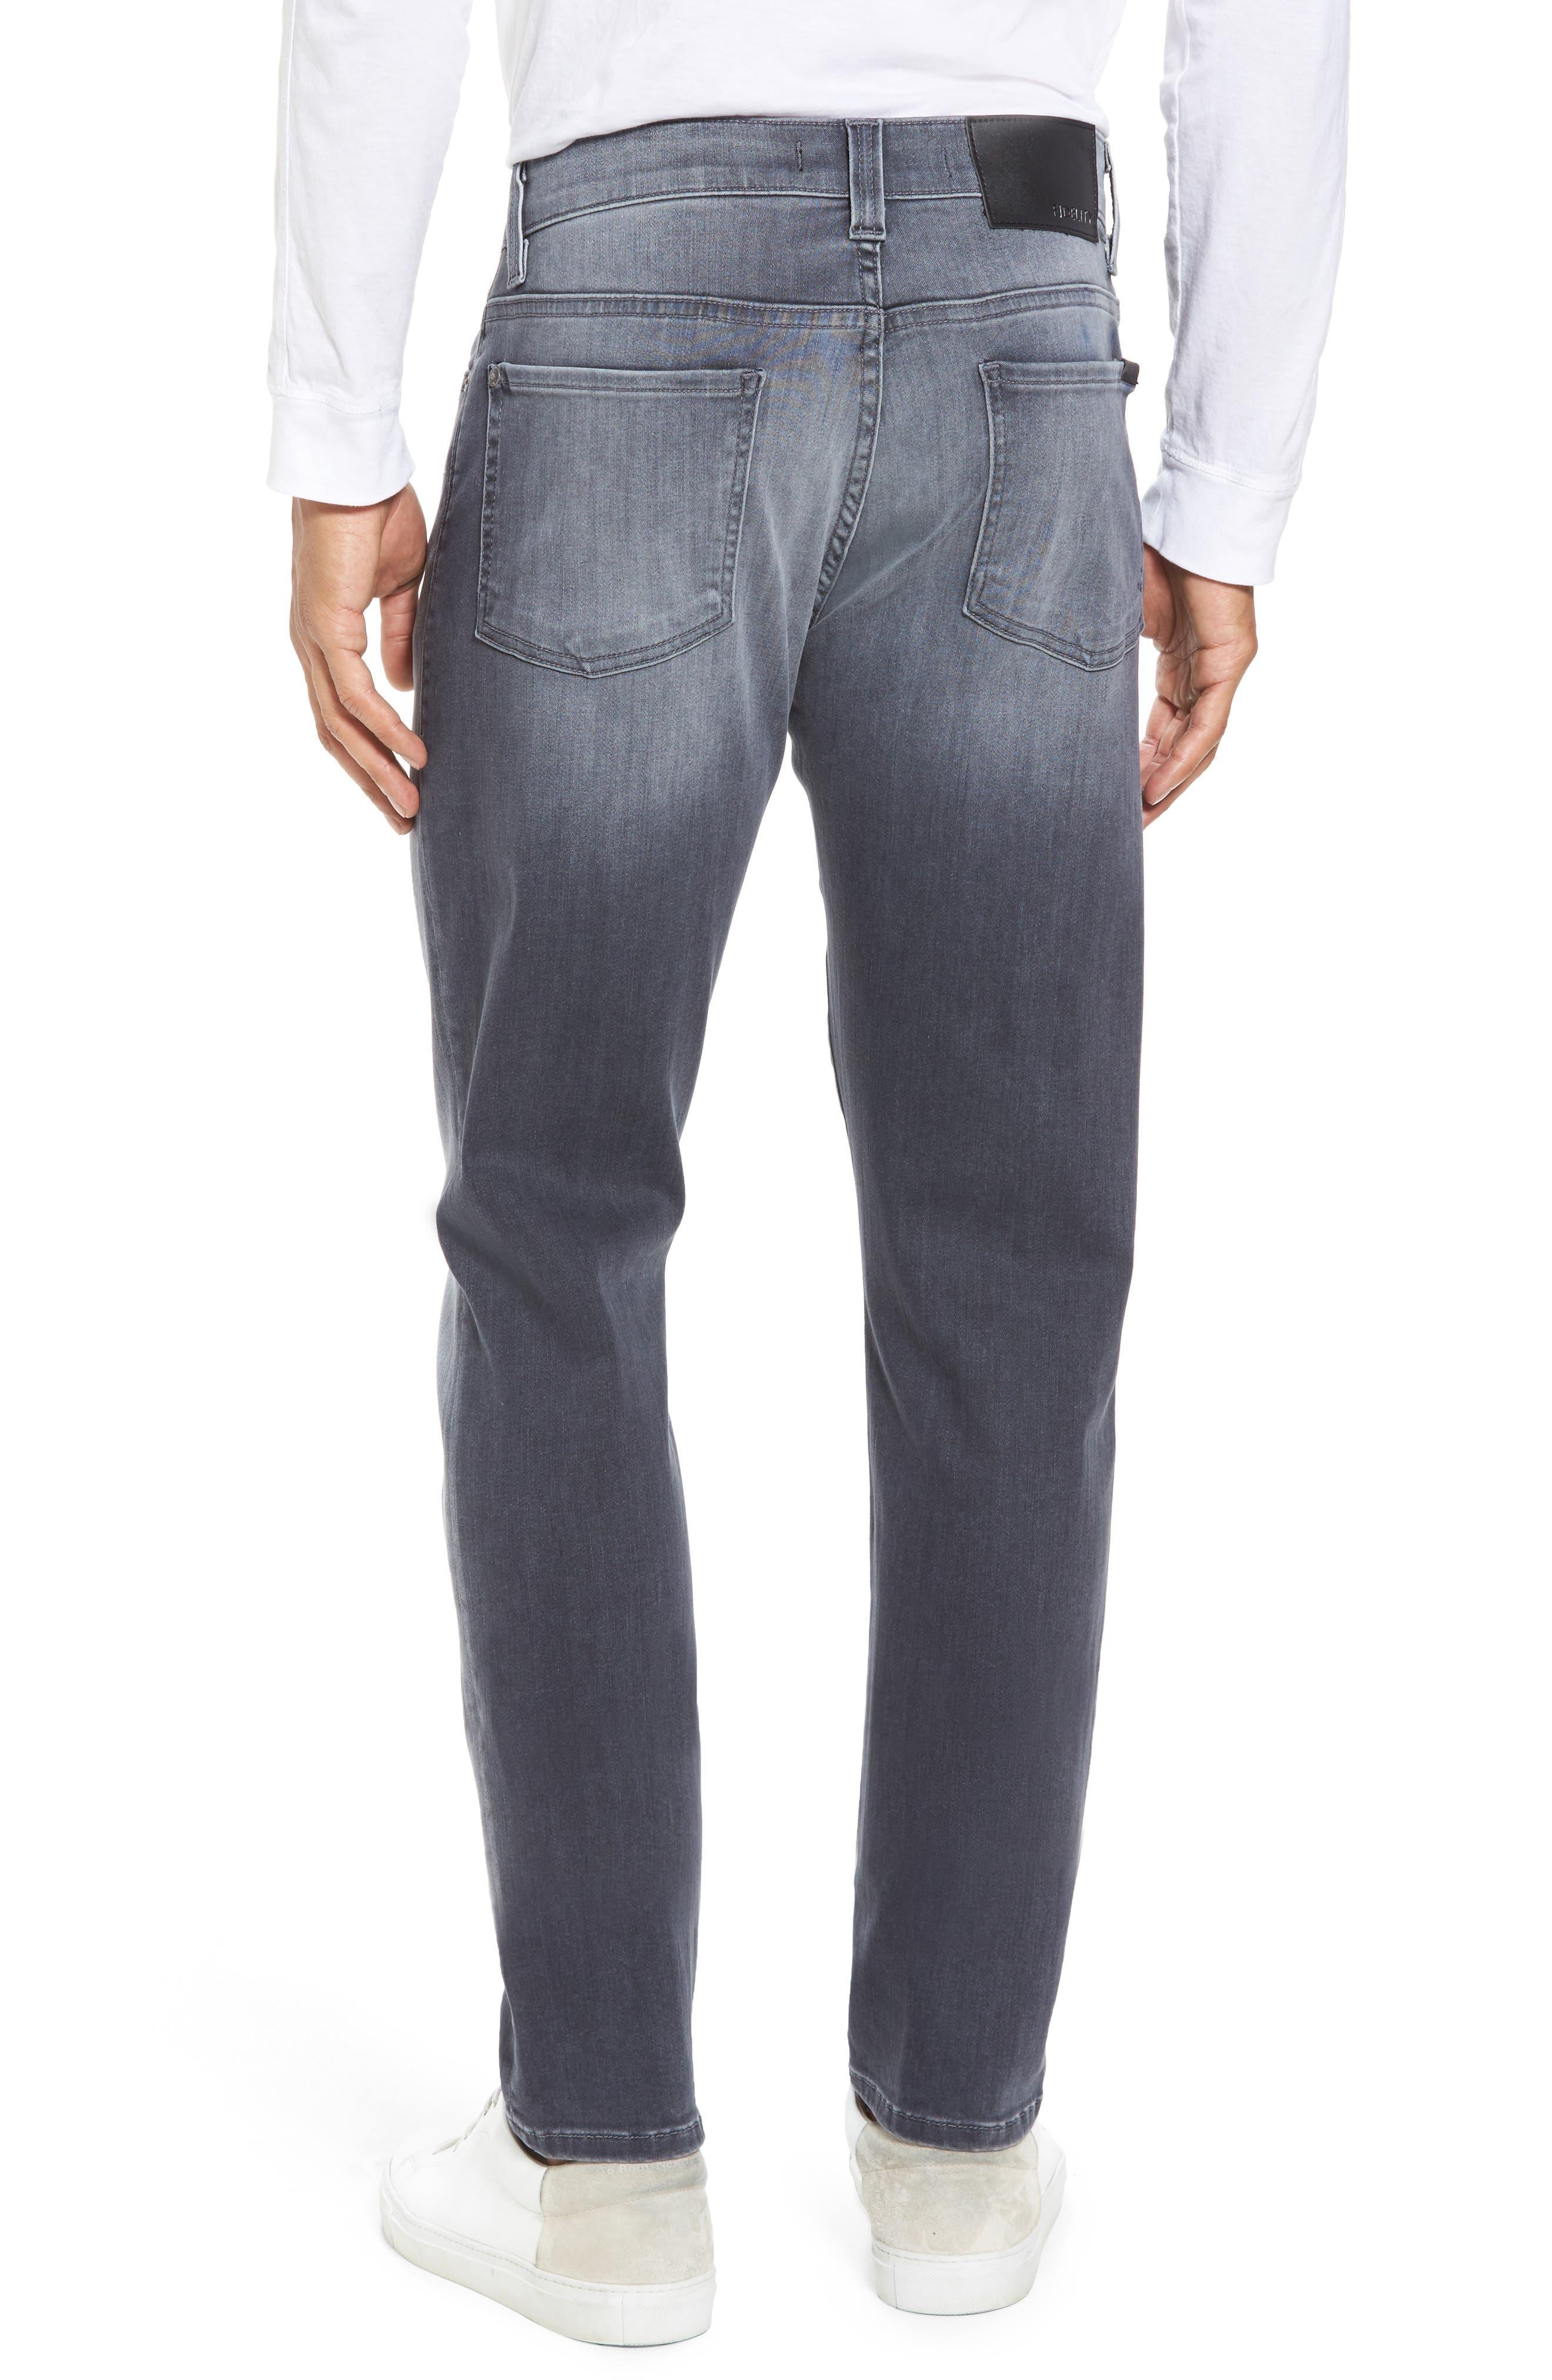 Torino Slim Fit Jeans,                             Alternate thumbnail 2, color,                             020